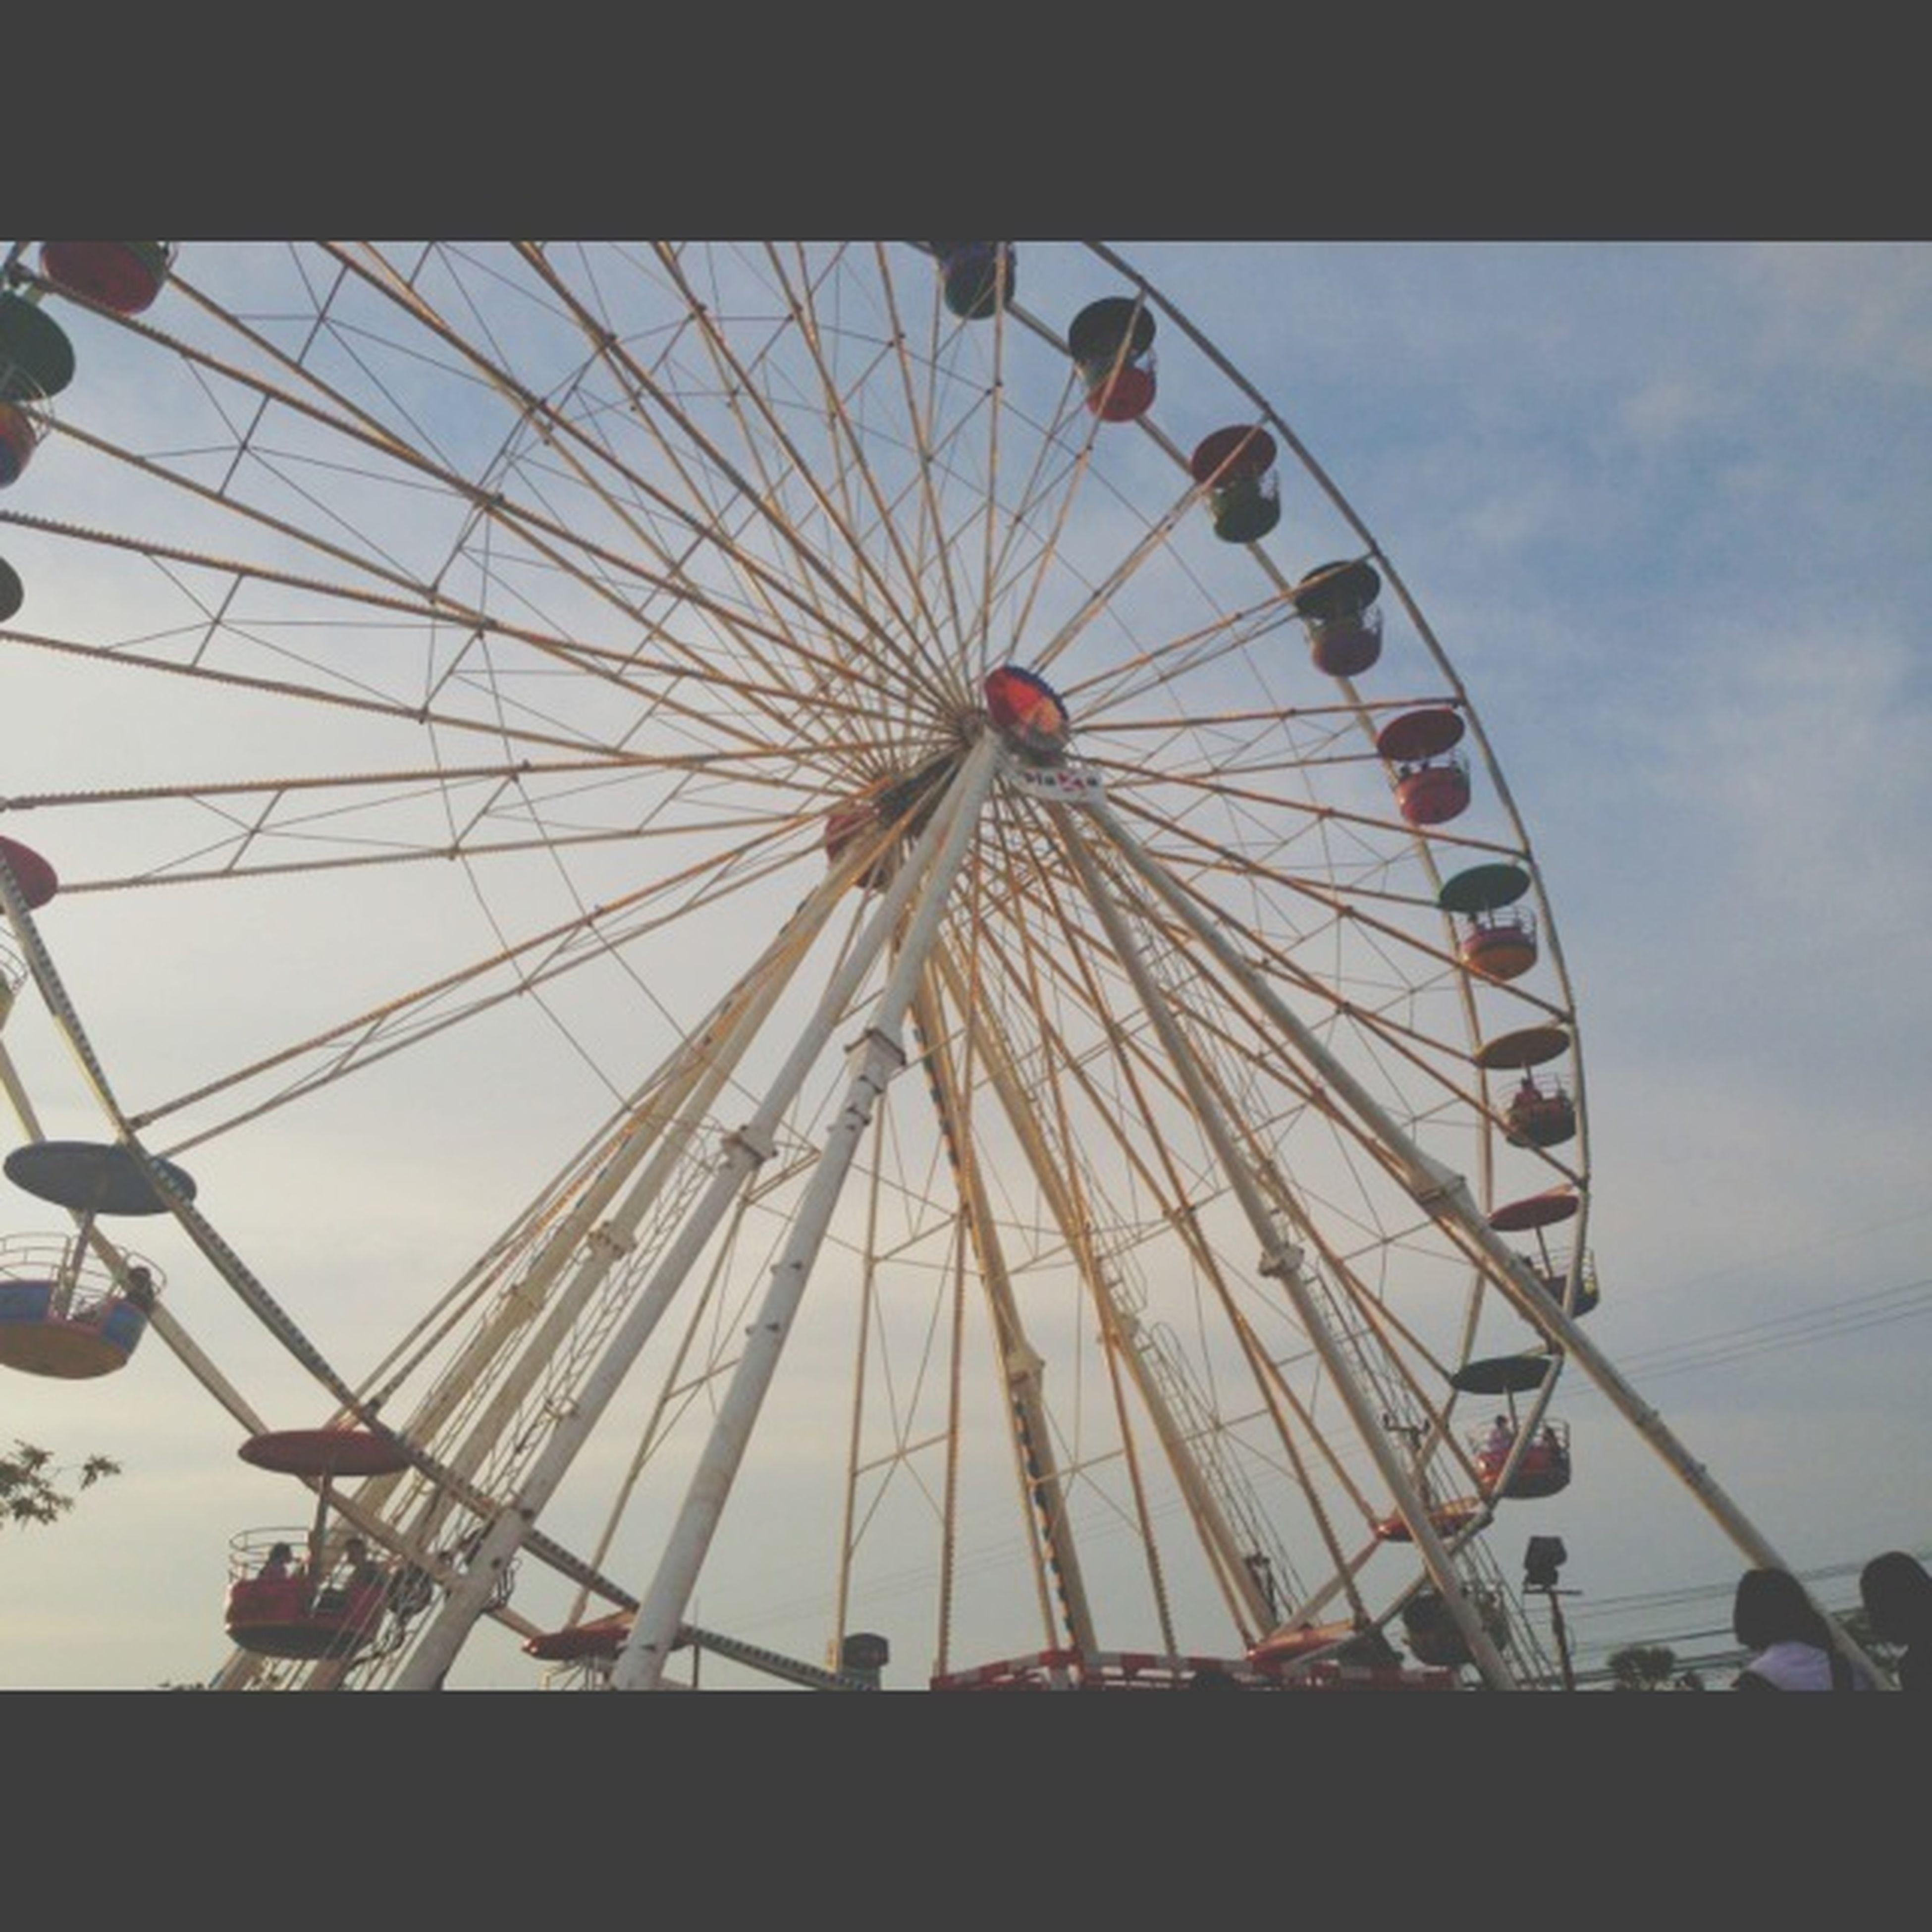 ferris wheel, amusement park, amusement park ride, low angle view, arts culture and entertainment, sky, built structure, architecture, cloud - sky, metal, outdoors, day, no people, cloud, large, cloudy, fun, big wheel, silhouette, circle